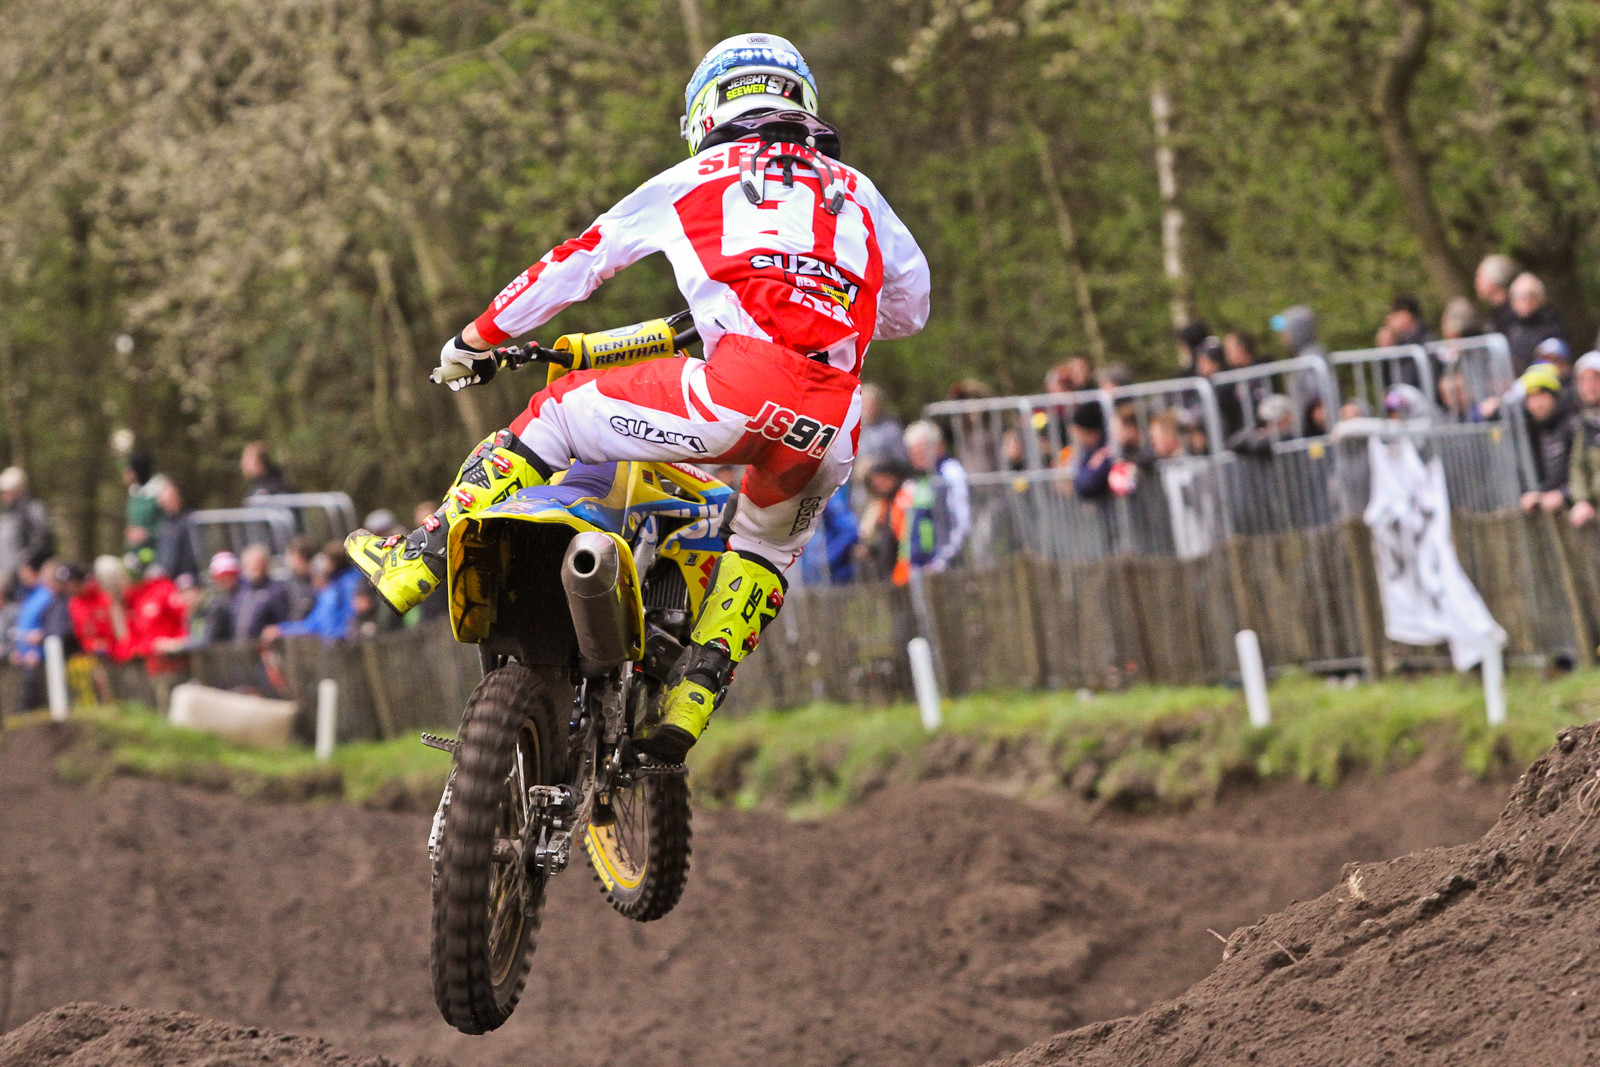 Jeremy Seewer - Photo Blast: 2017 MXGP of Valkenswaard - Motocross Pictures - Vital MX